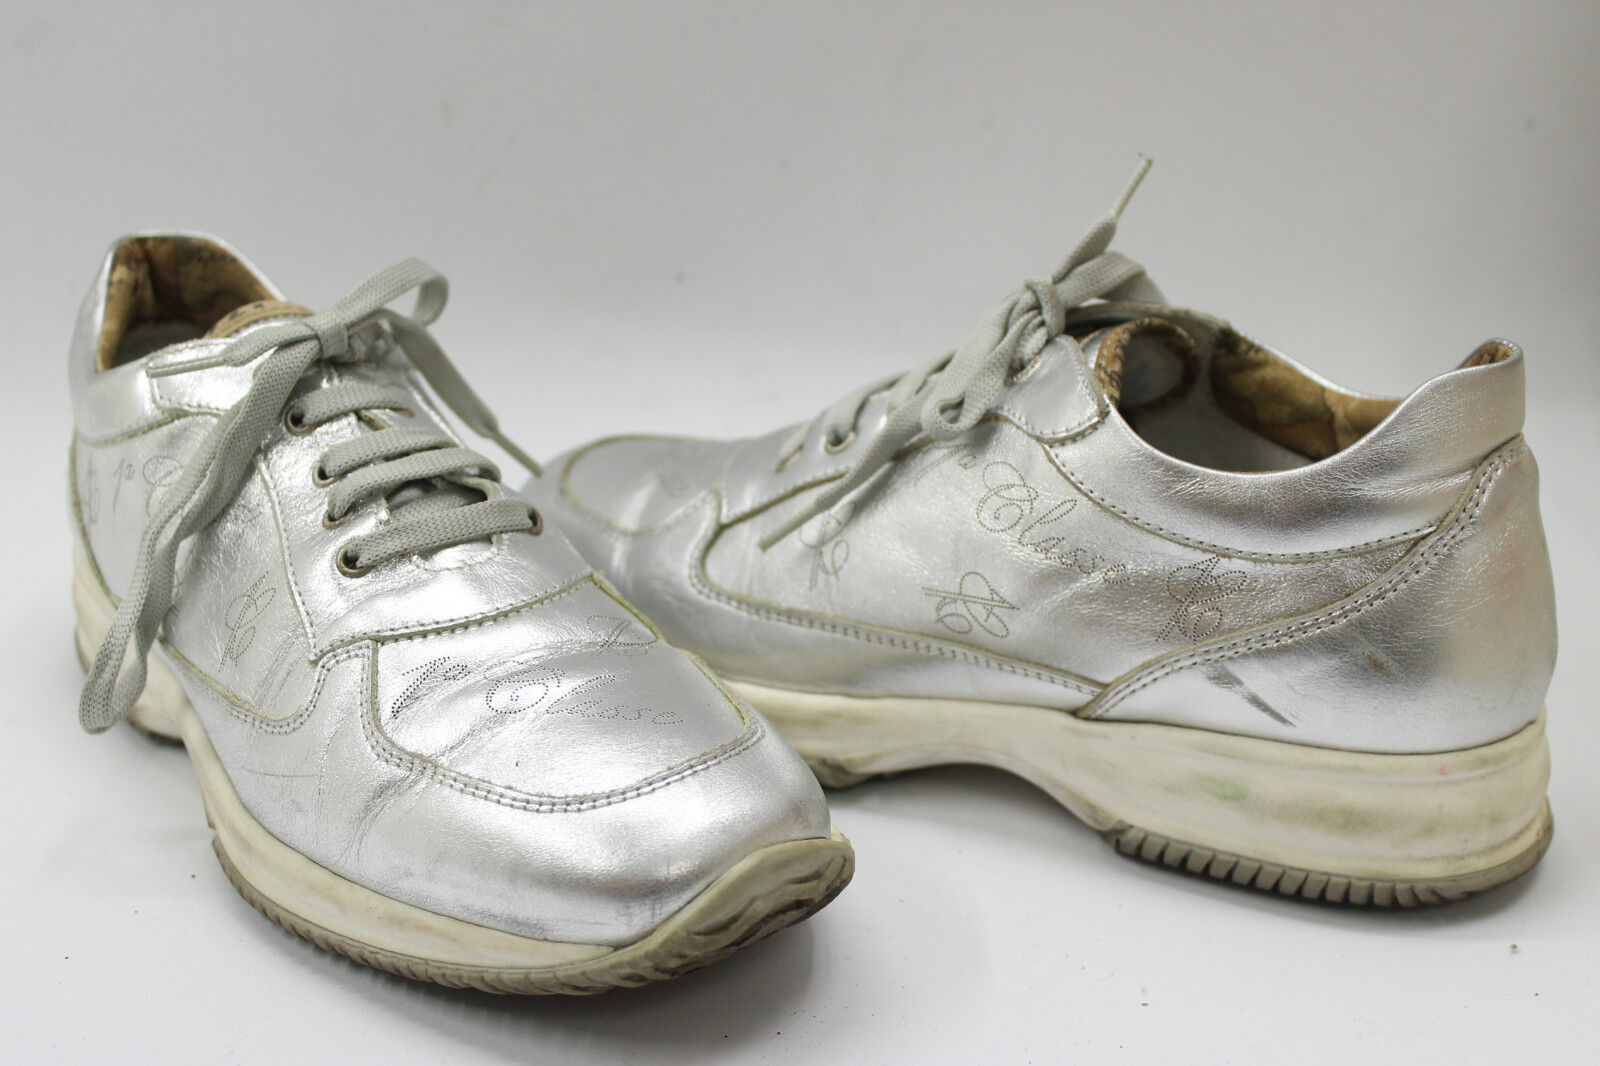 ALVIERO MARTINI Damens schuhe Leder sz 6 Europe 36 silver Leder schuhe S6868 1f78a5